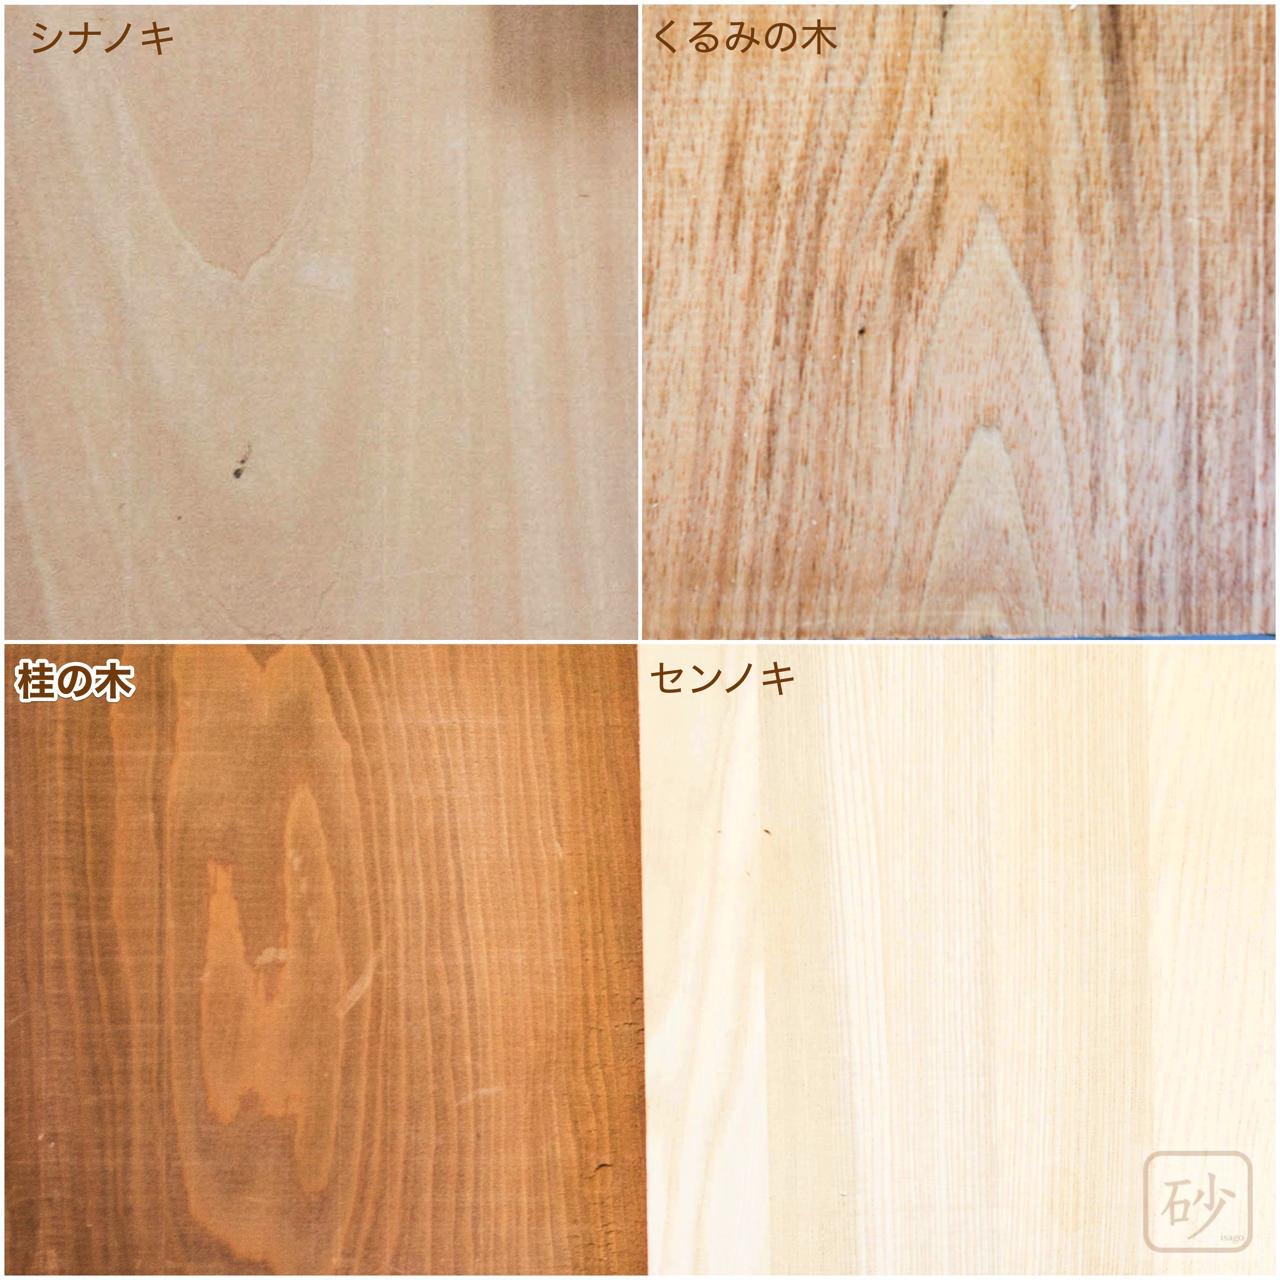 木彫り用木材